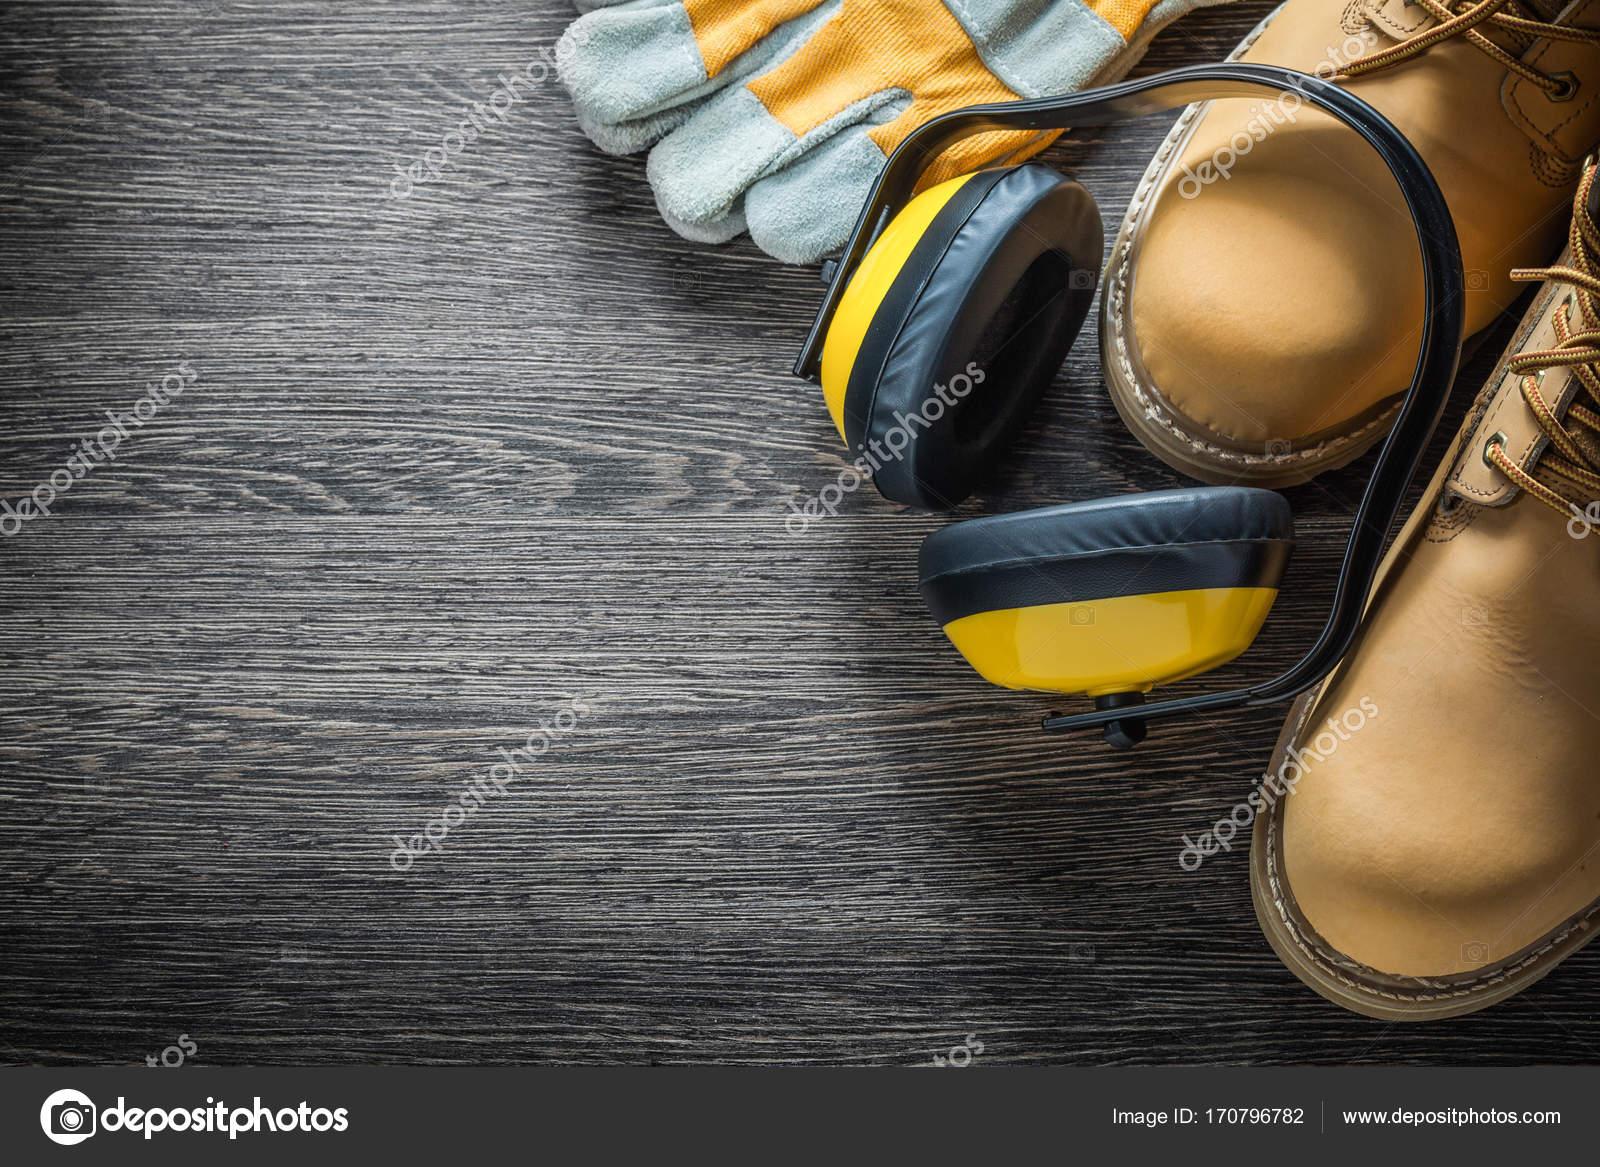 a3fd2223690 Προστατευτικά γάντια εργασίας ωτοασπίδες μπότες για ξύλινη σανίδα —  Φωτογραφία Αρχείου